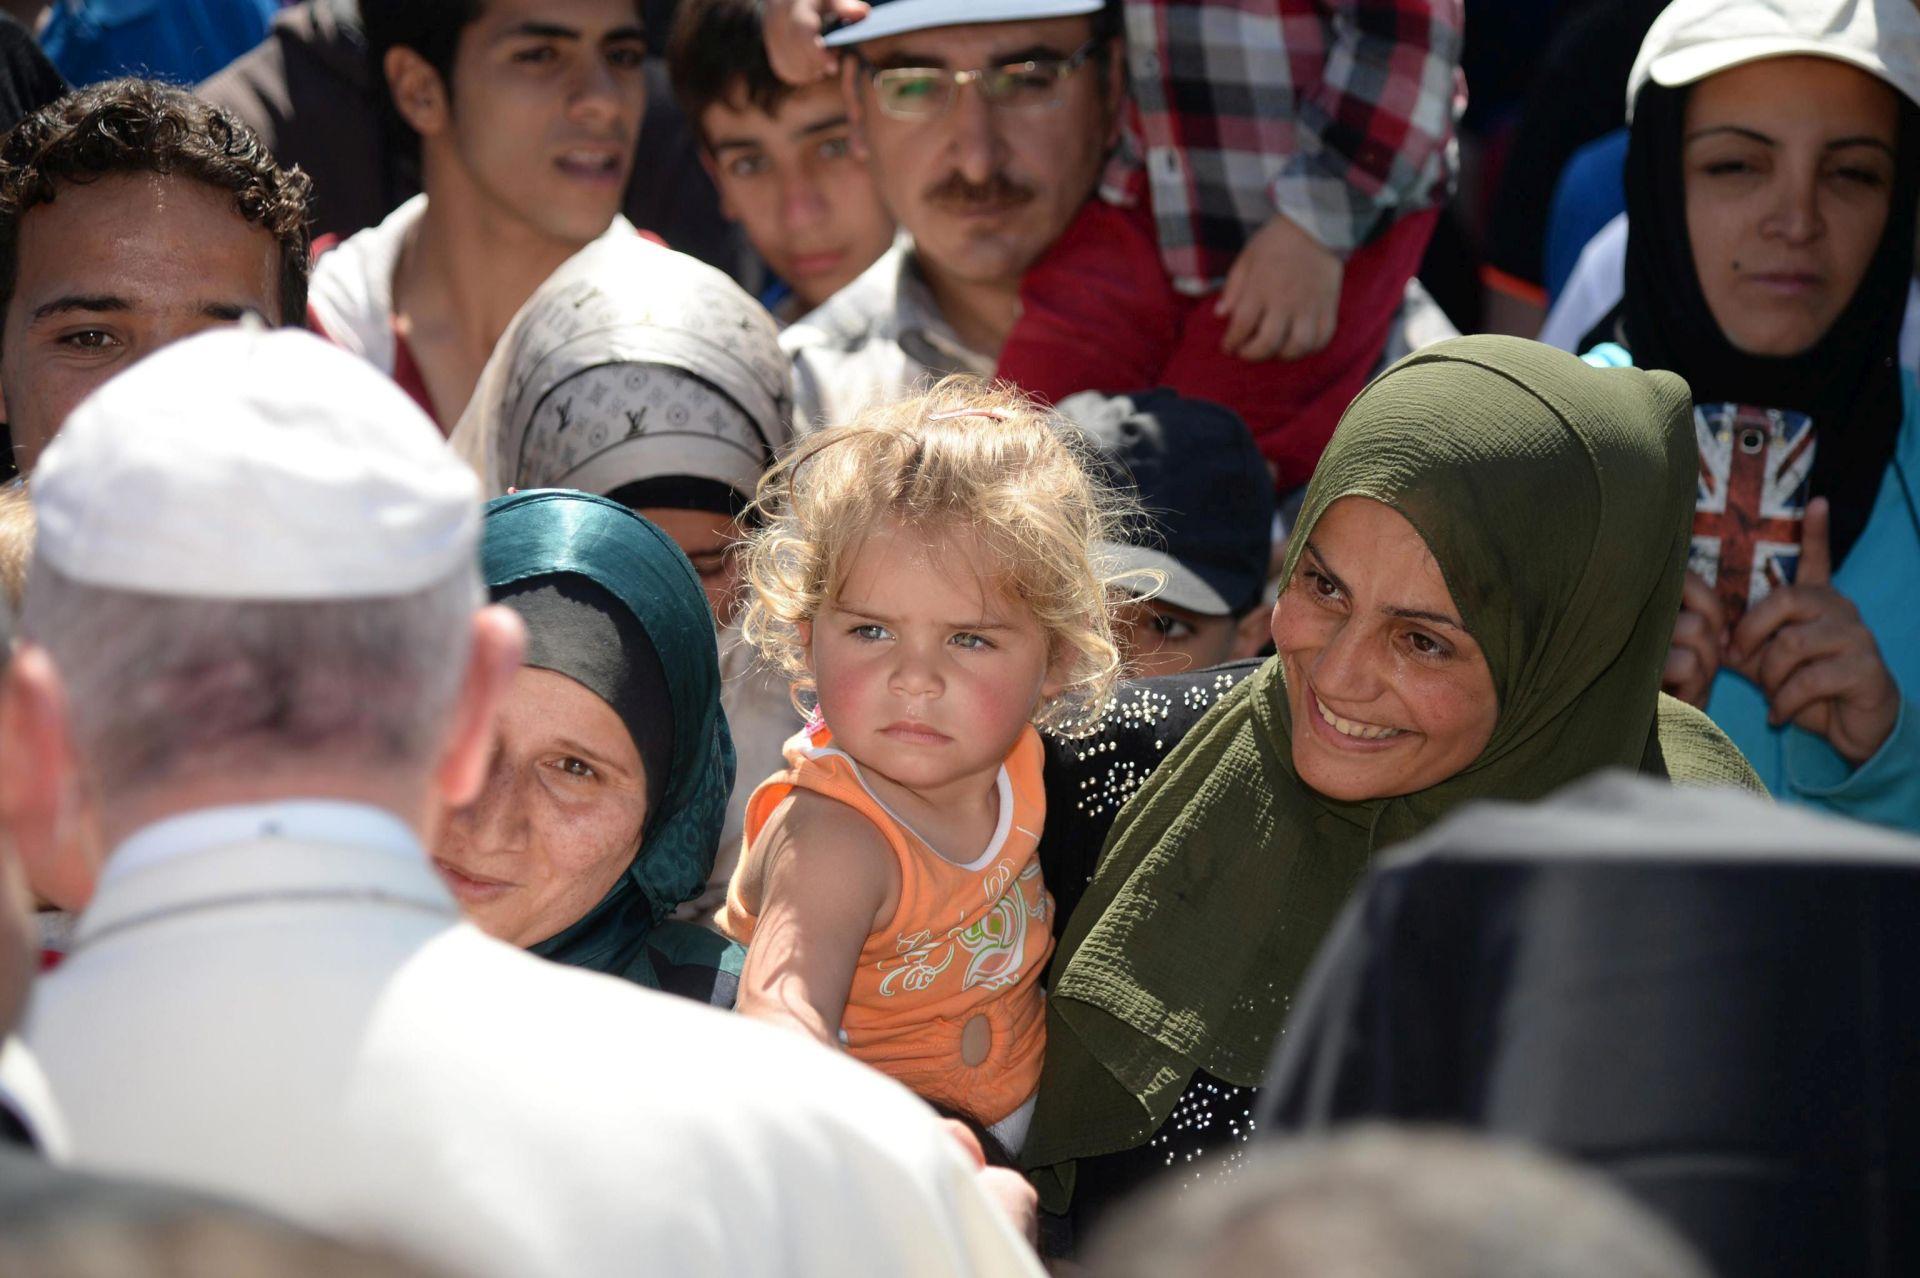 ZAVRŠEN POSJET NA LEZBOSU: Papa Franjo poveo sa sobom u Vatikan tri sirijske obitelji